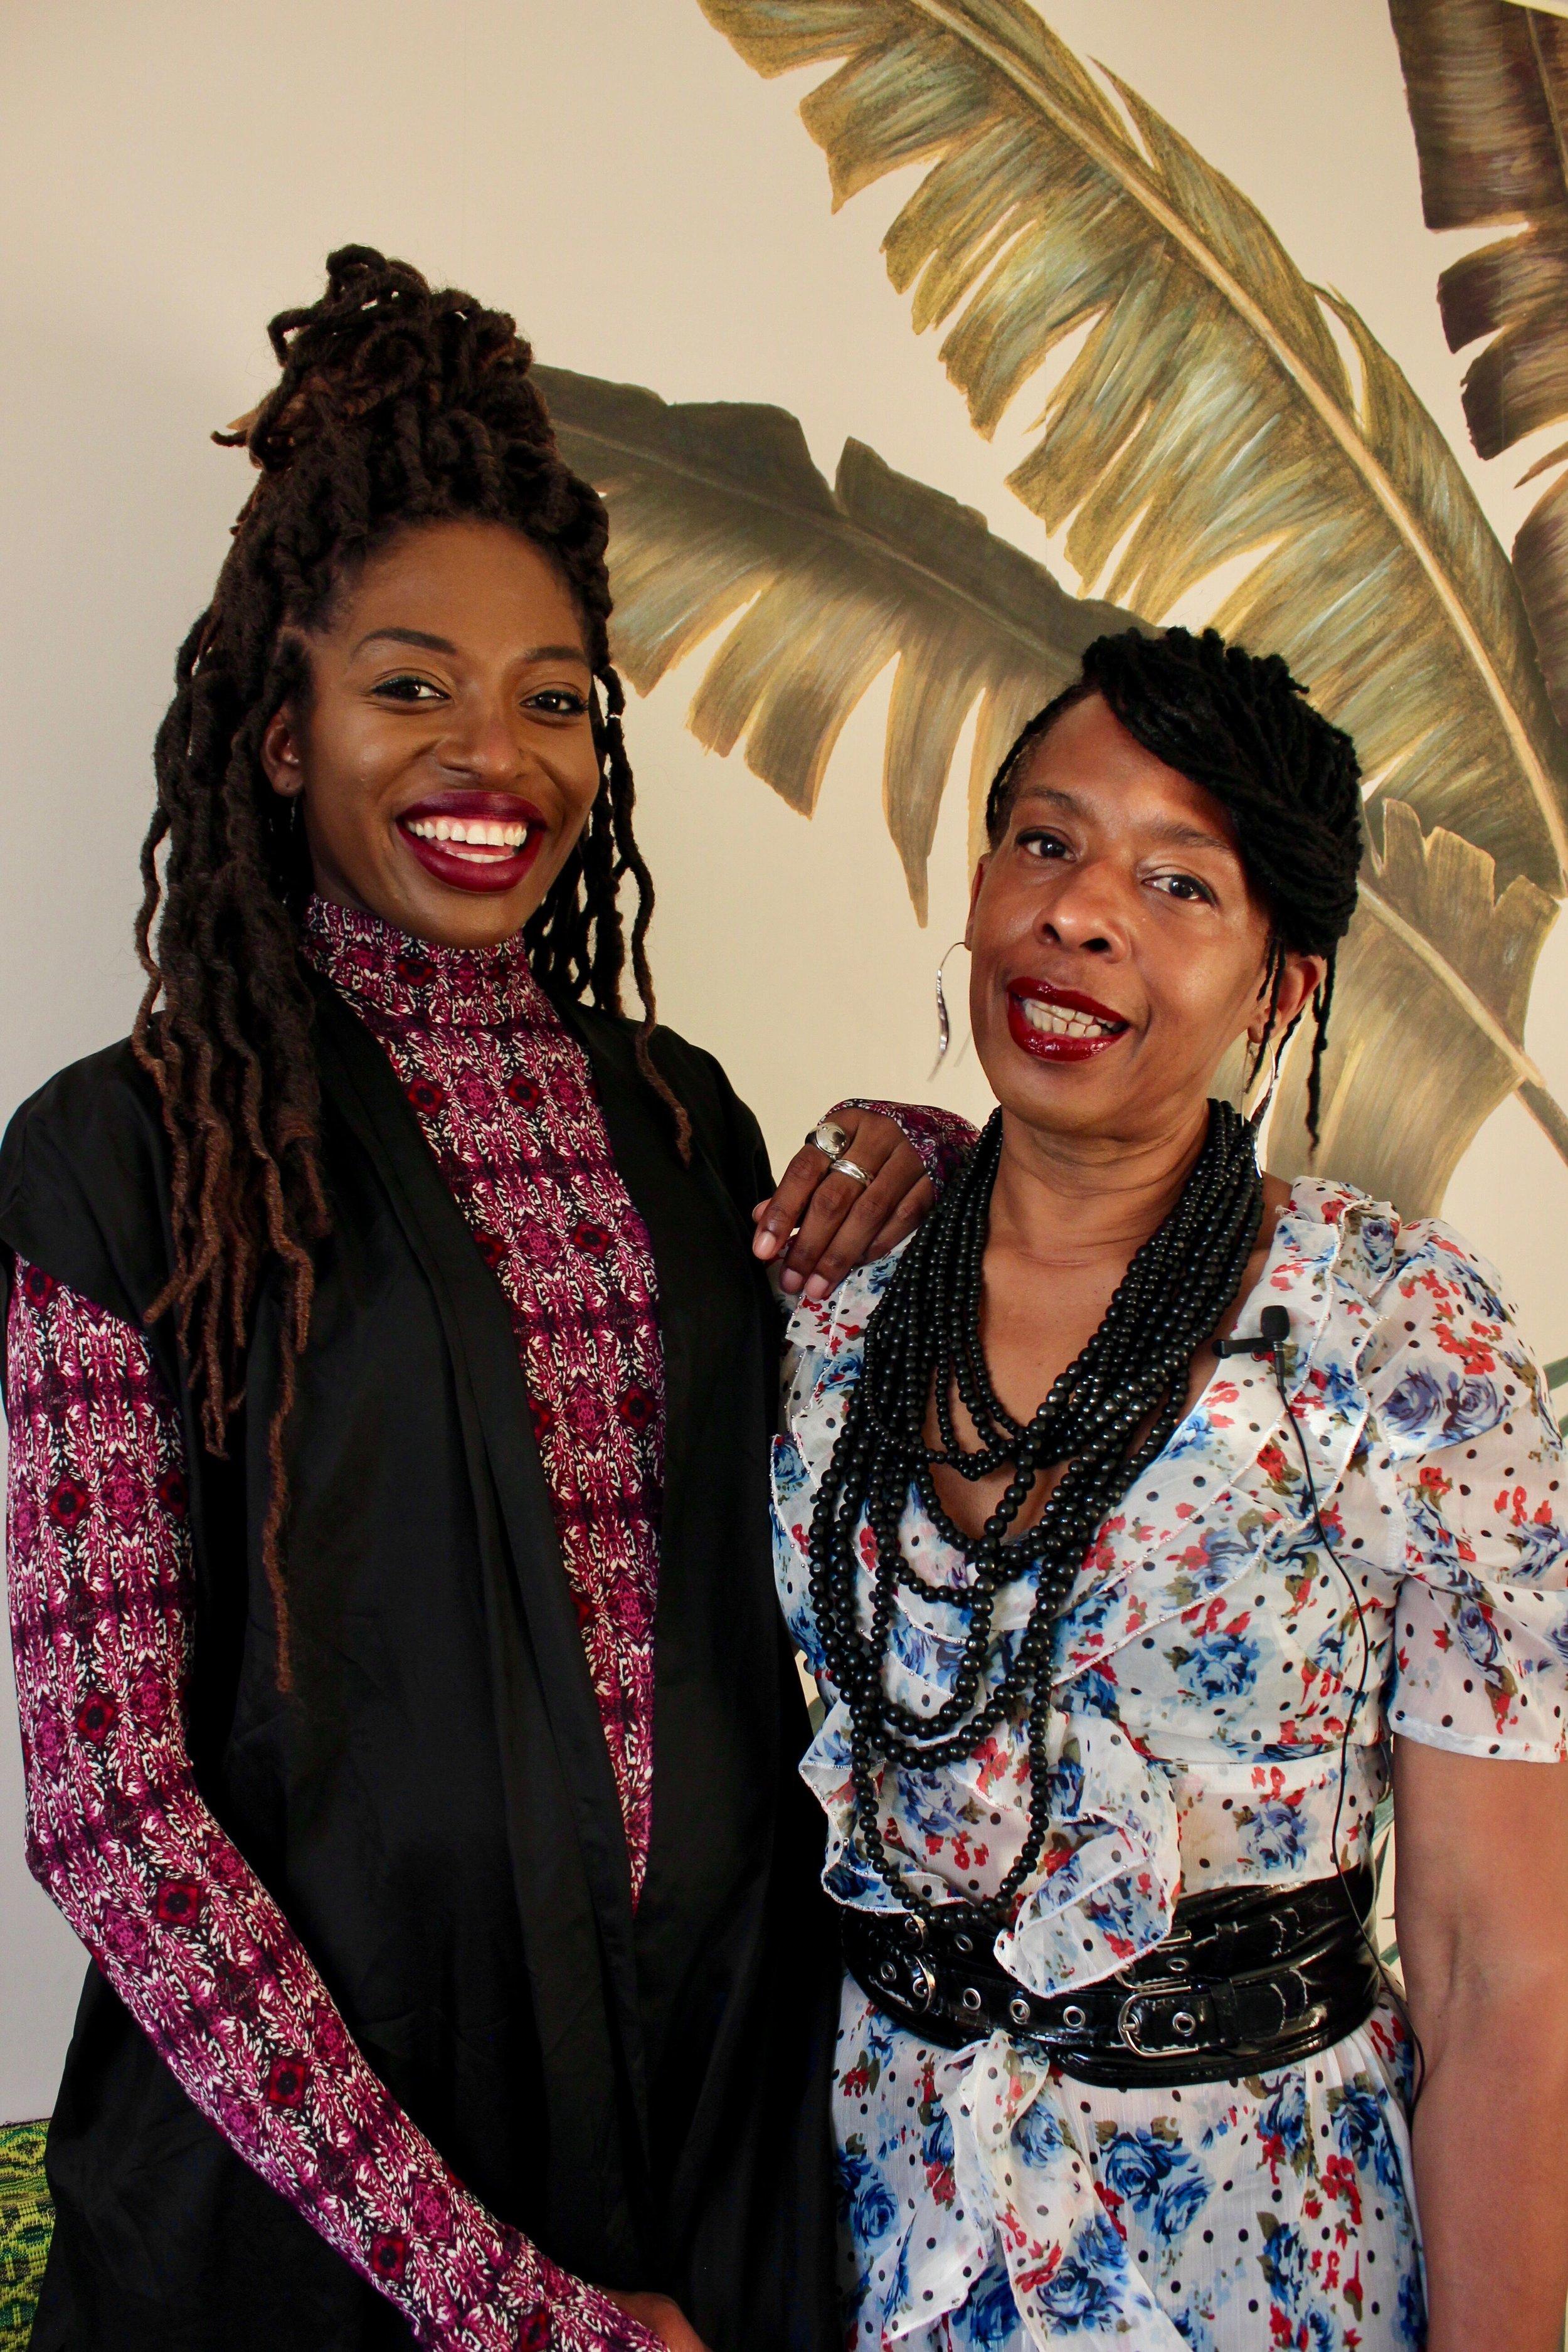 Elizabeth-Yemi Akingbade and #YemziGirl September Sharnain, a curator of space